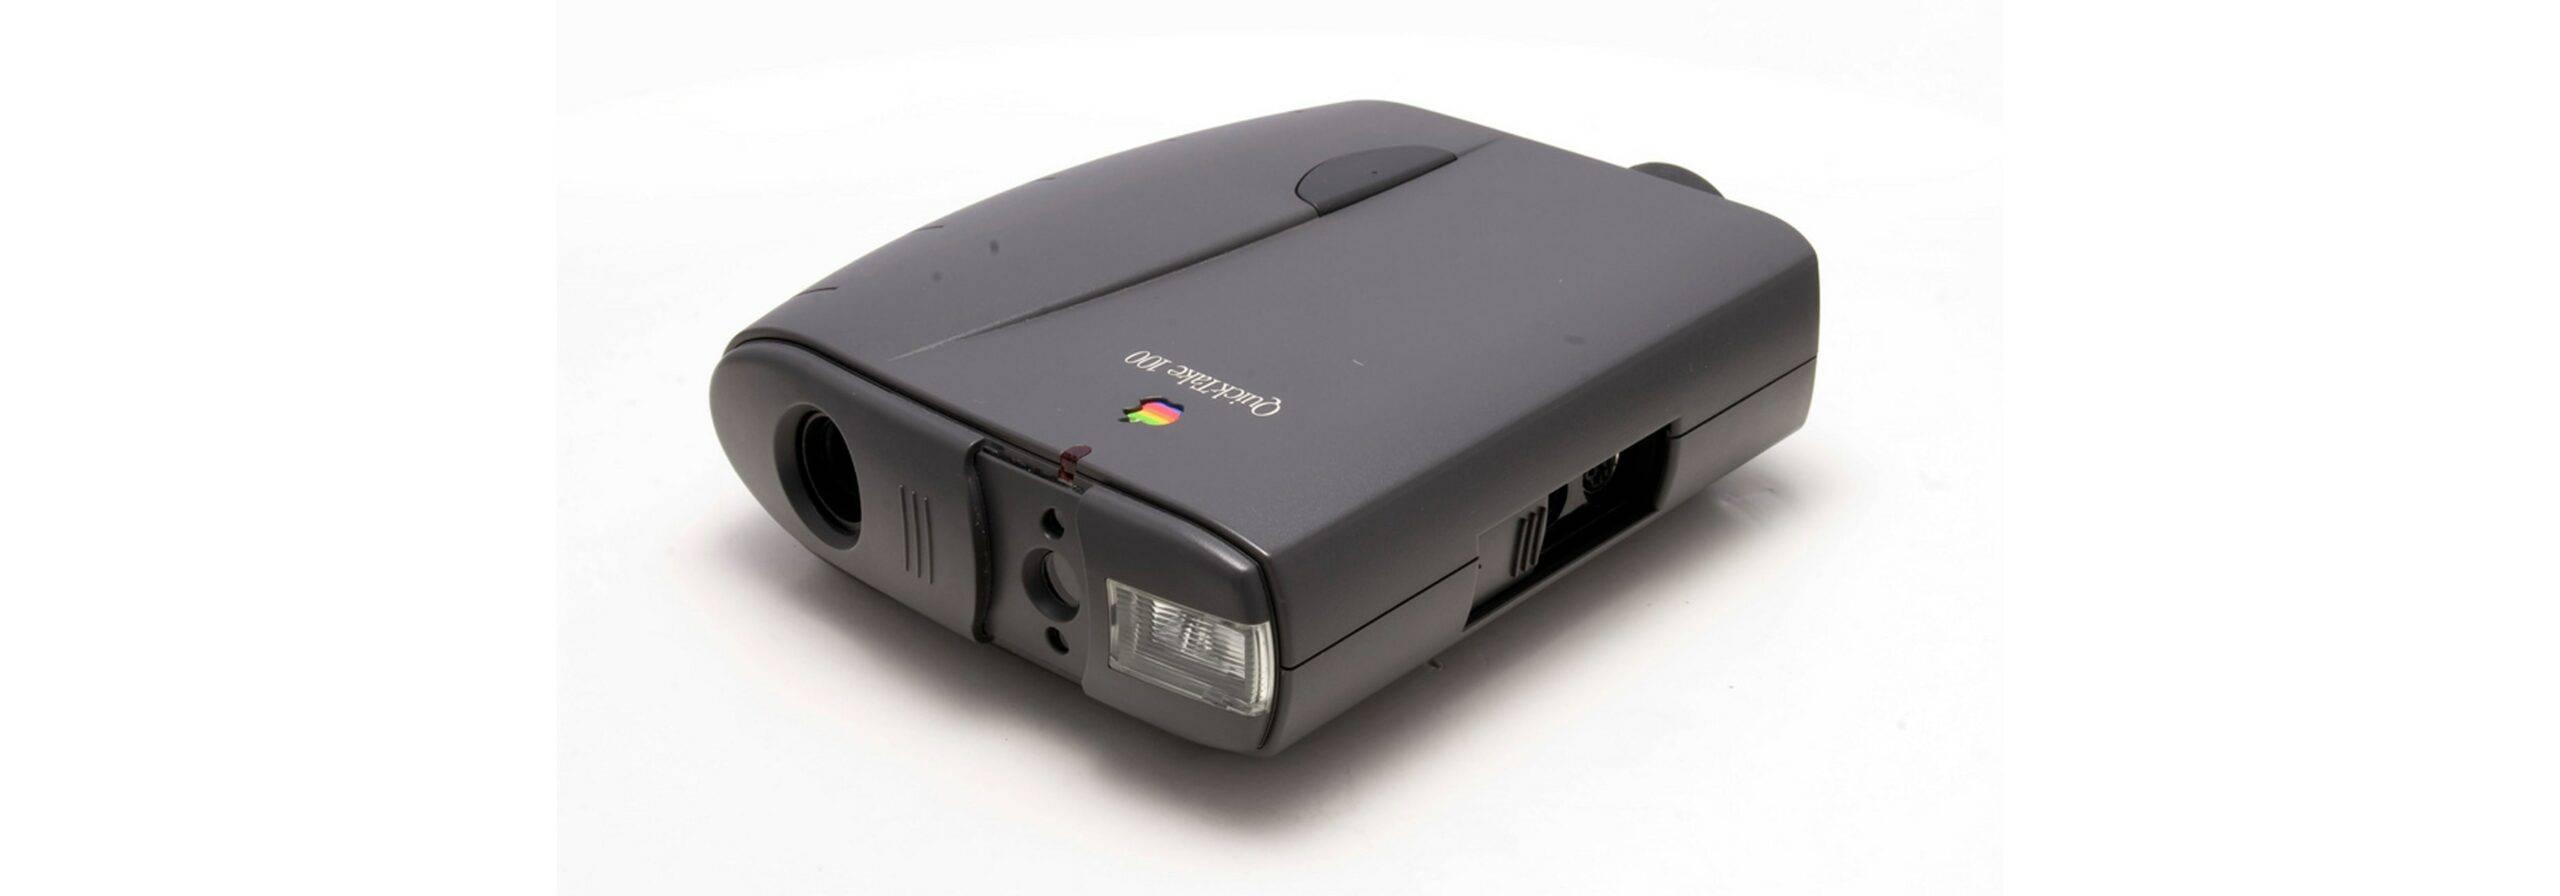 Apple's QuickTake Camera